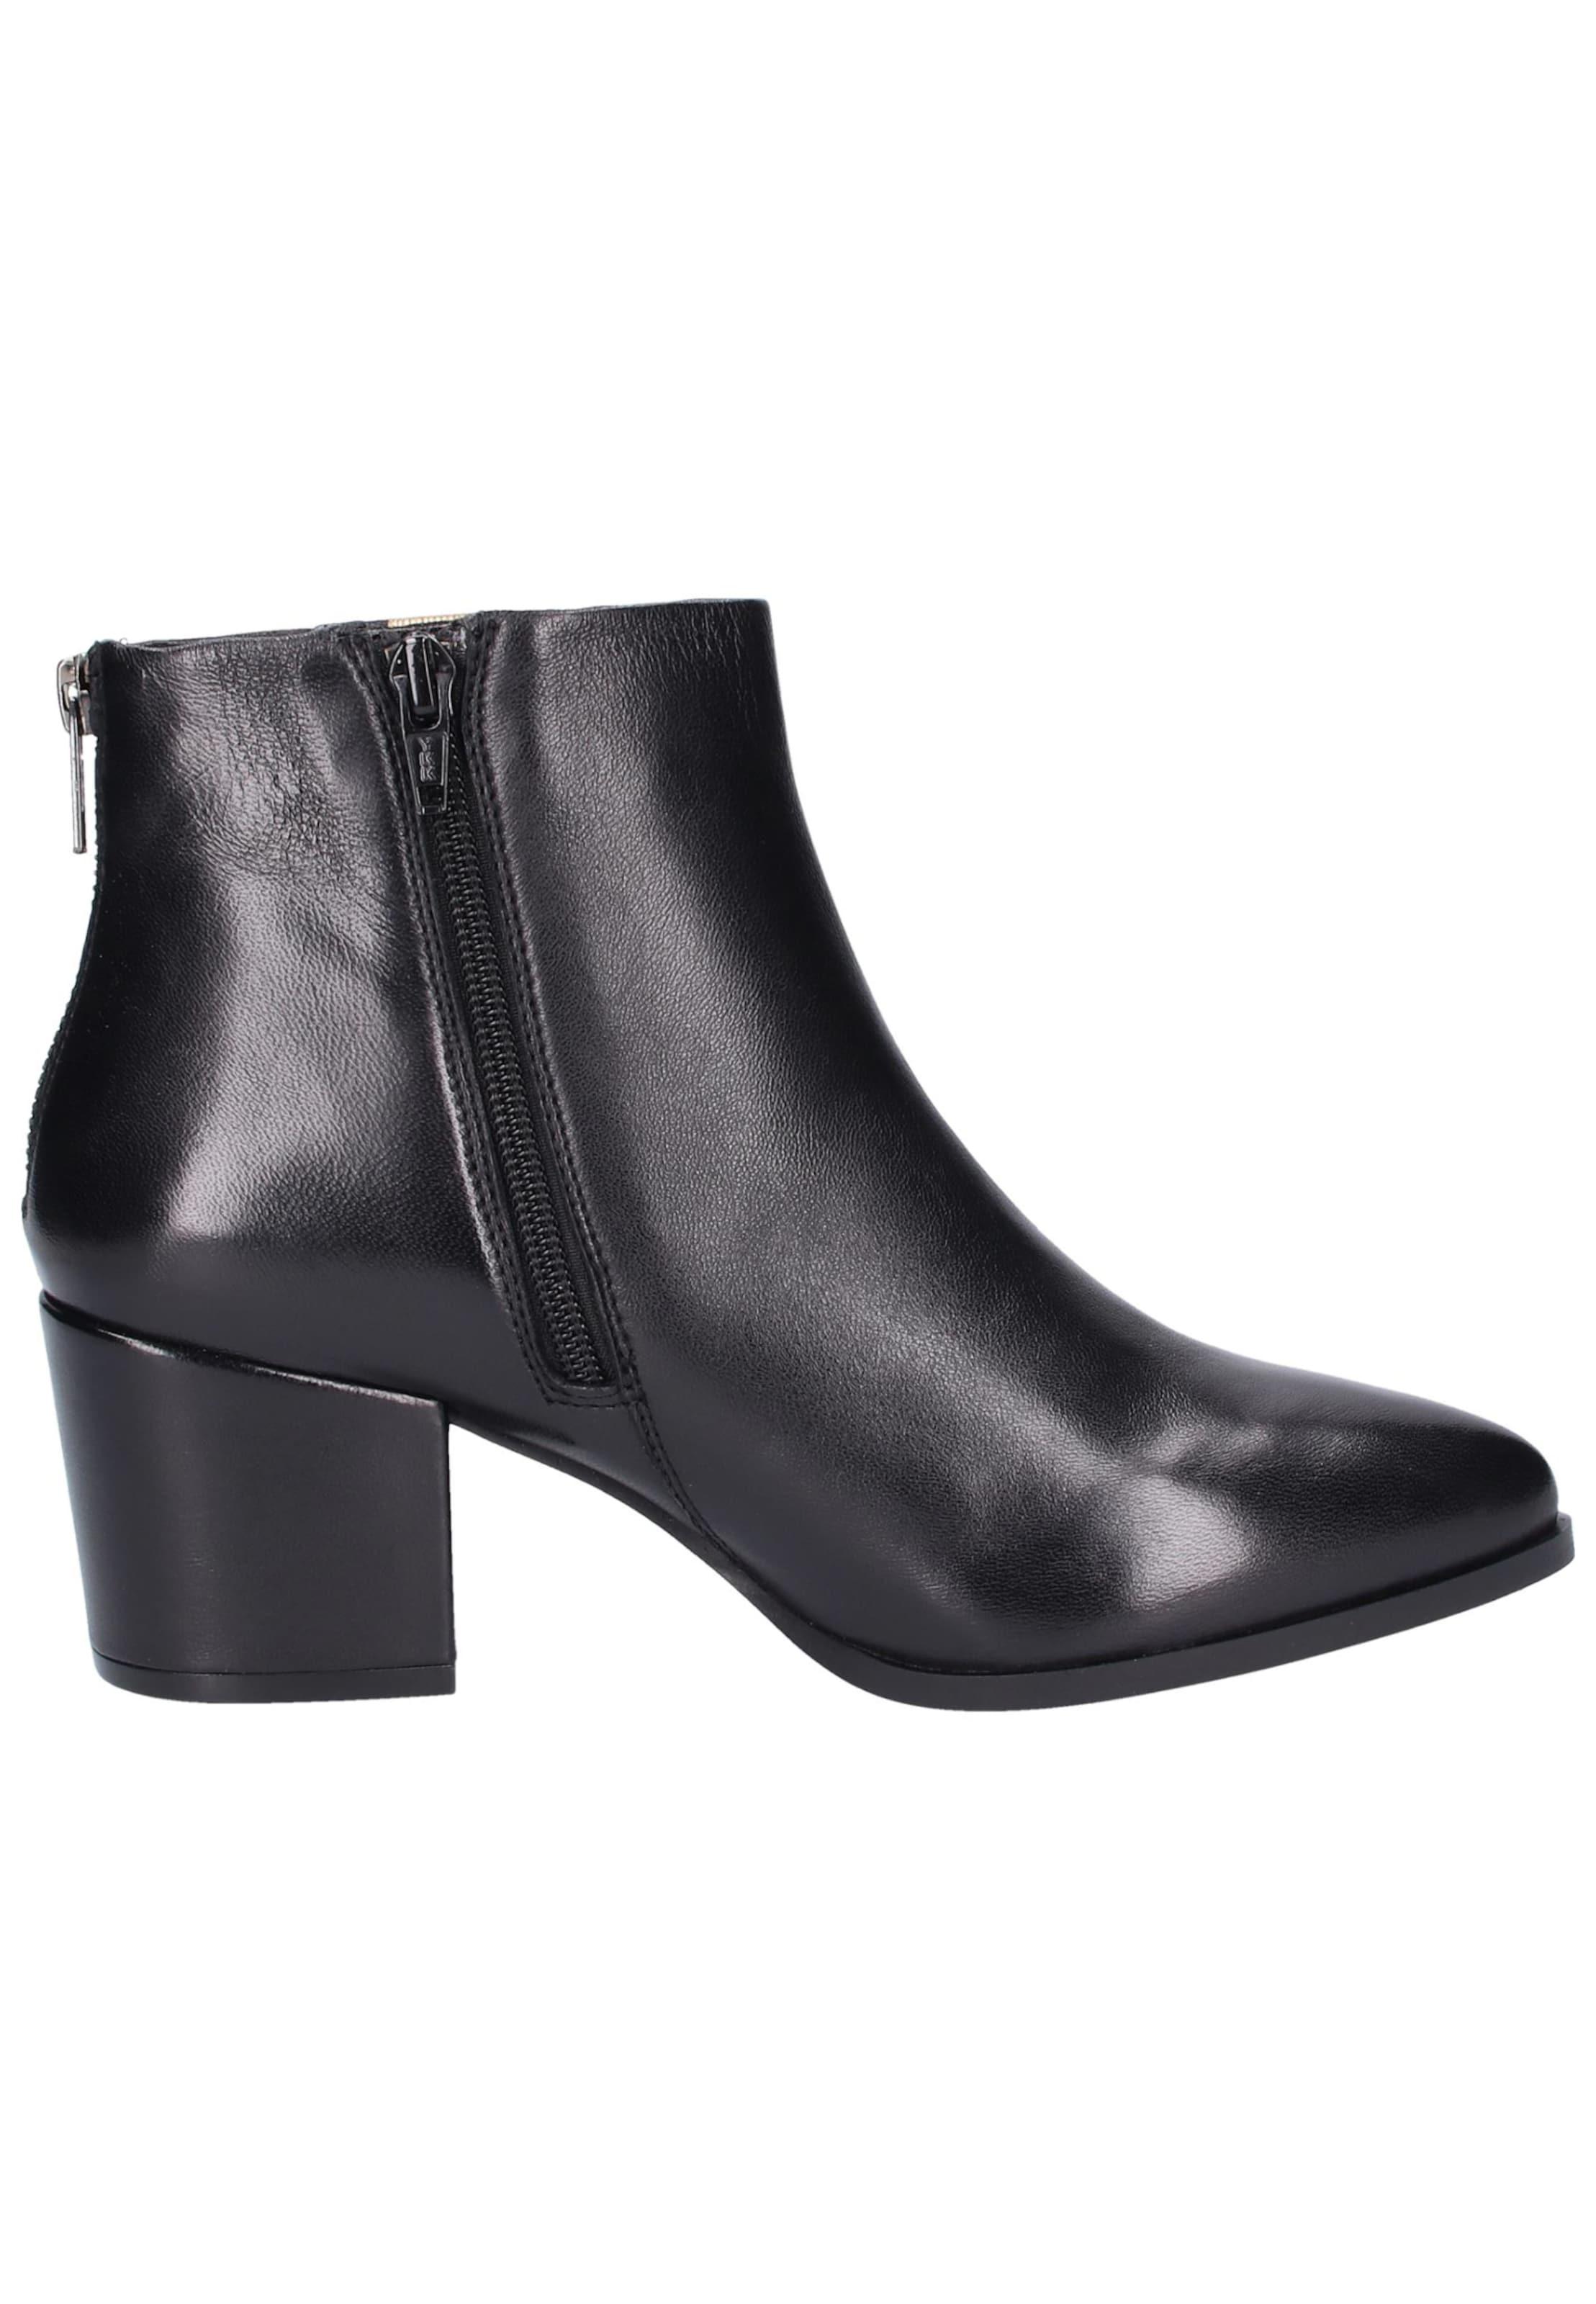 Spm In Ankle 'nanny' GoldSchwarz Boots rCWBQoedx